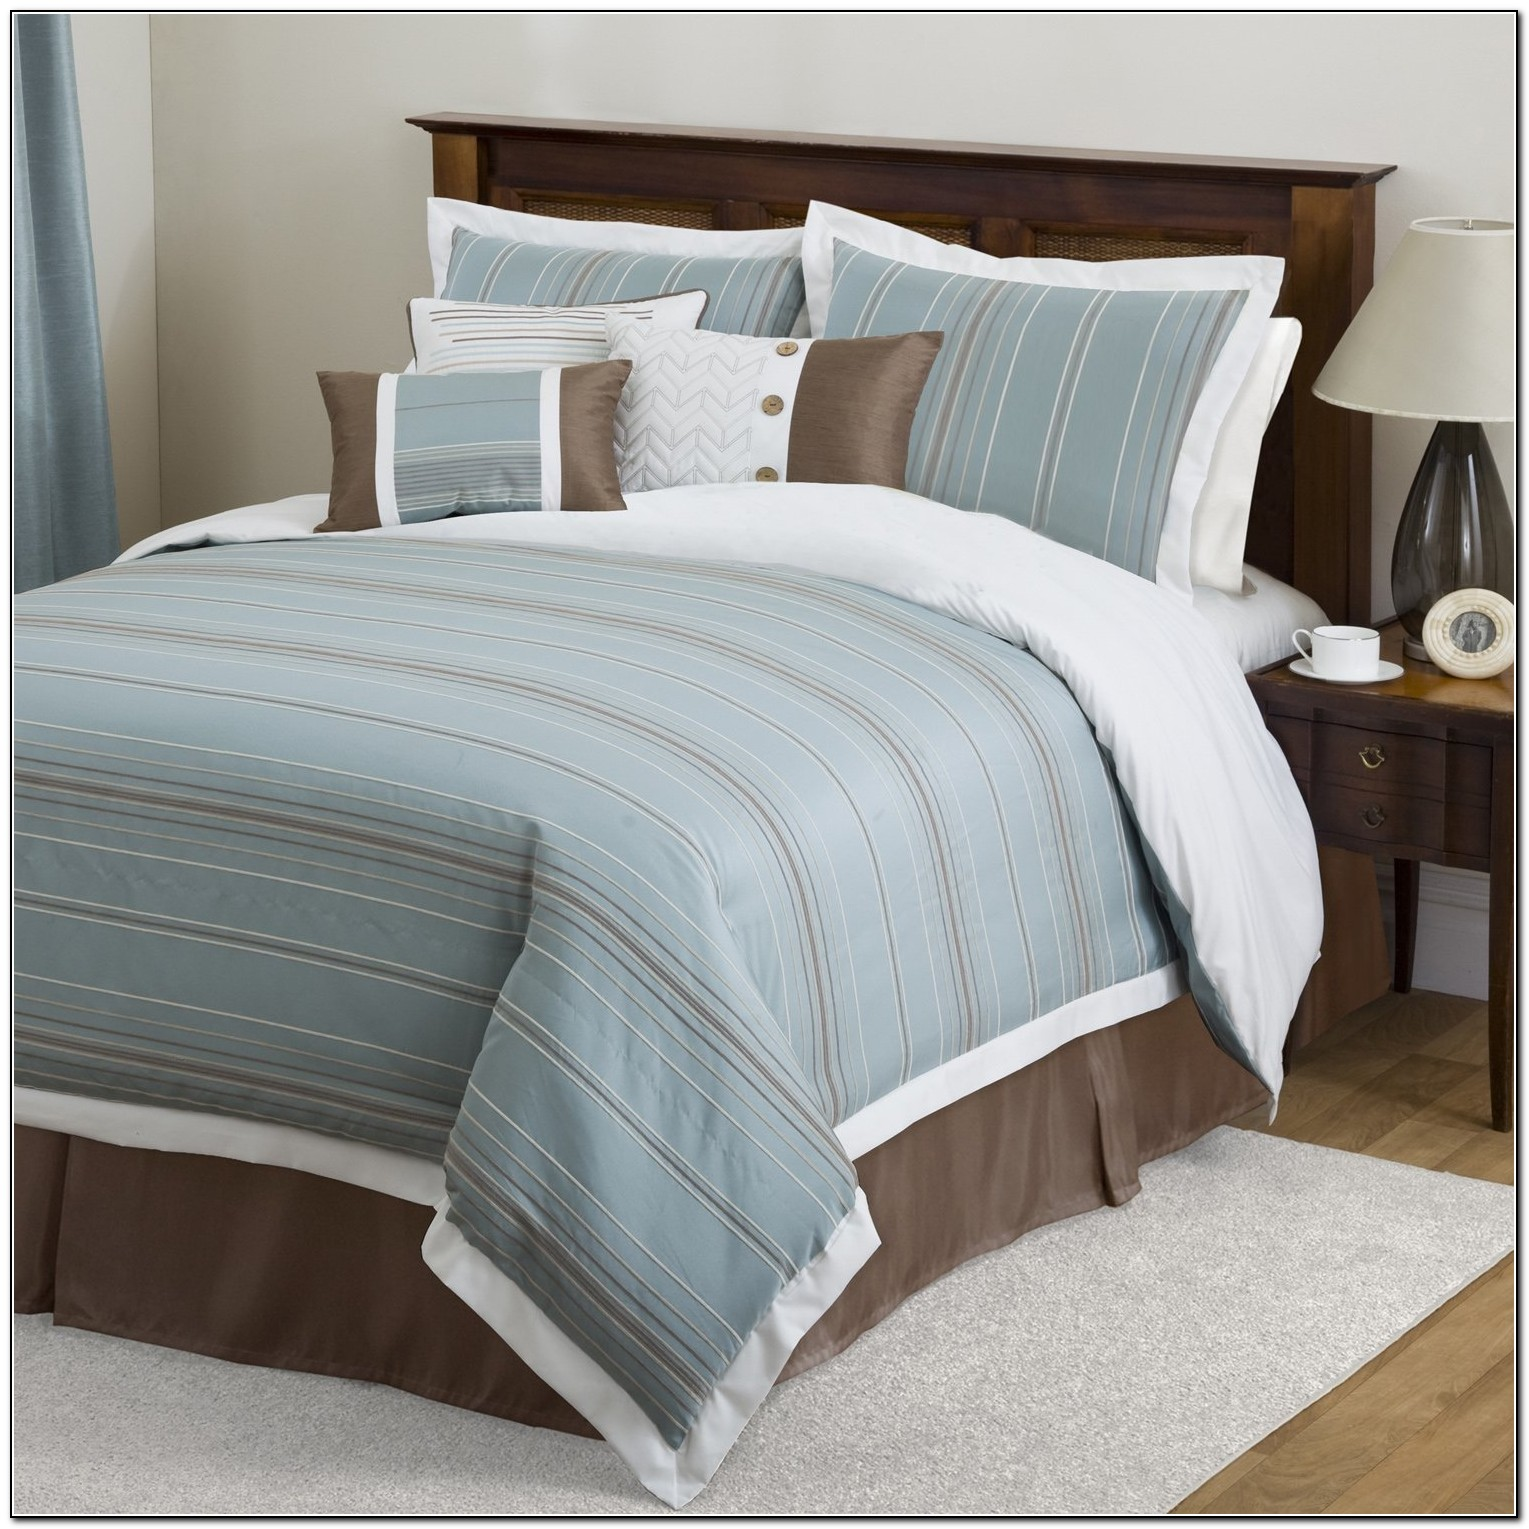 Queen Bedding Sets Target Beds Home Design Ideas